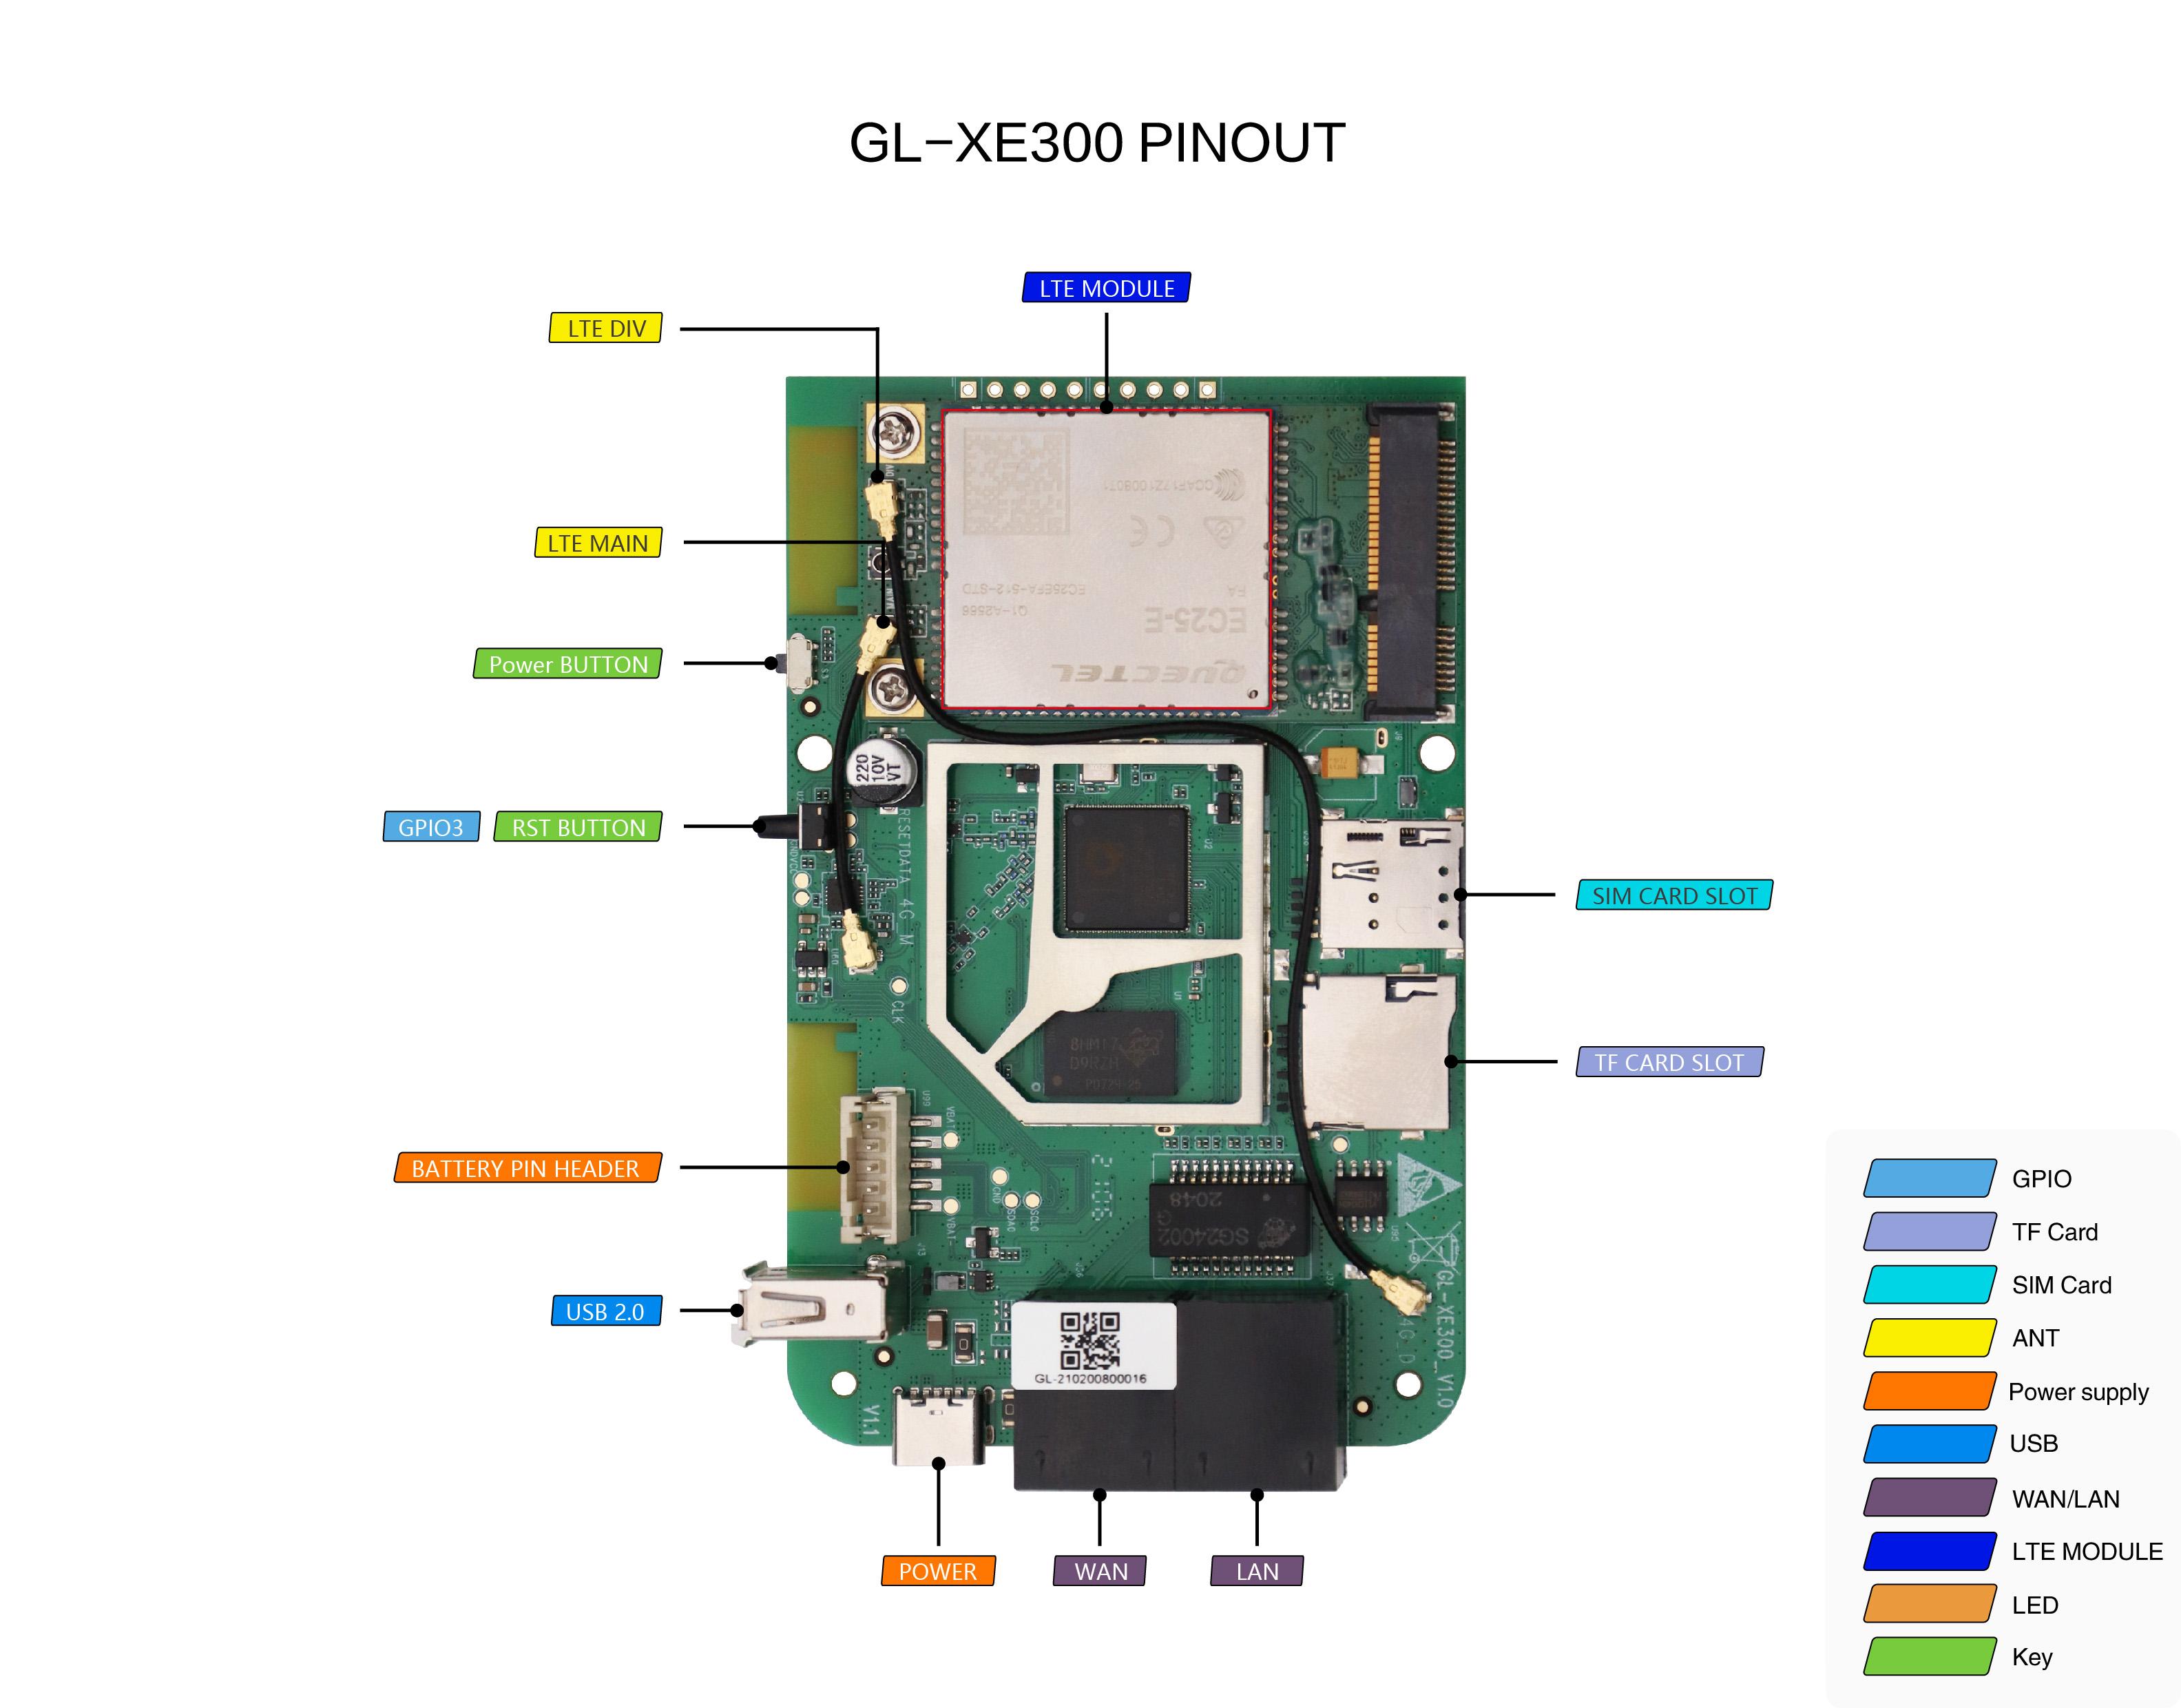 gl-xe300 pcb pinout